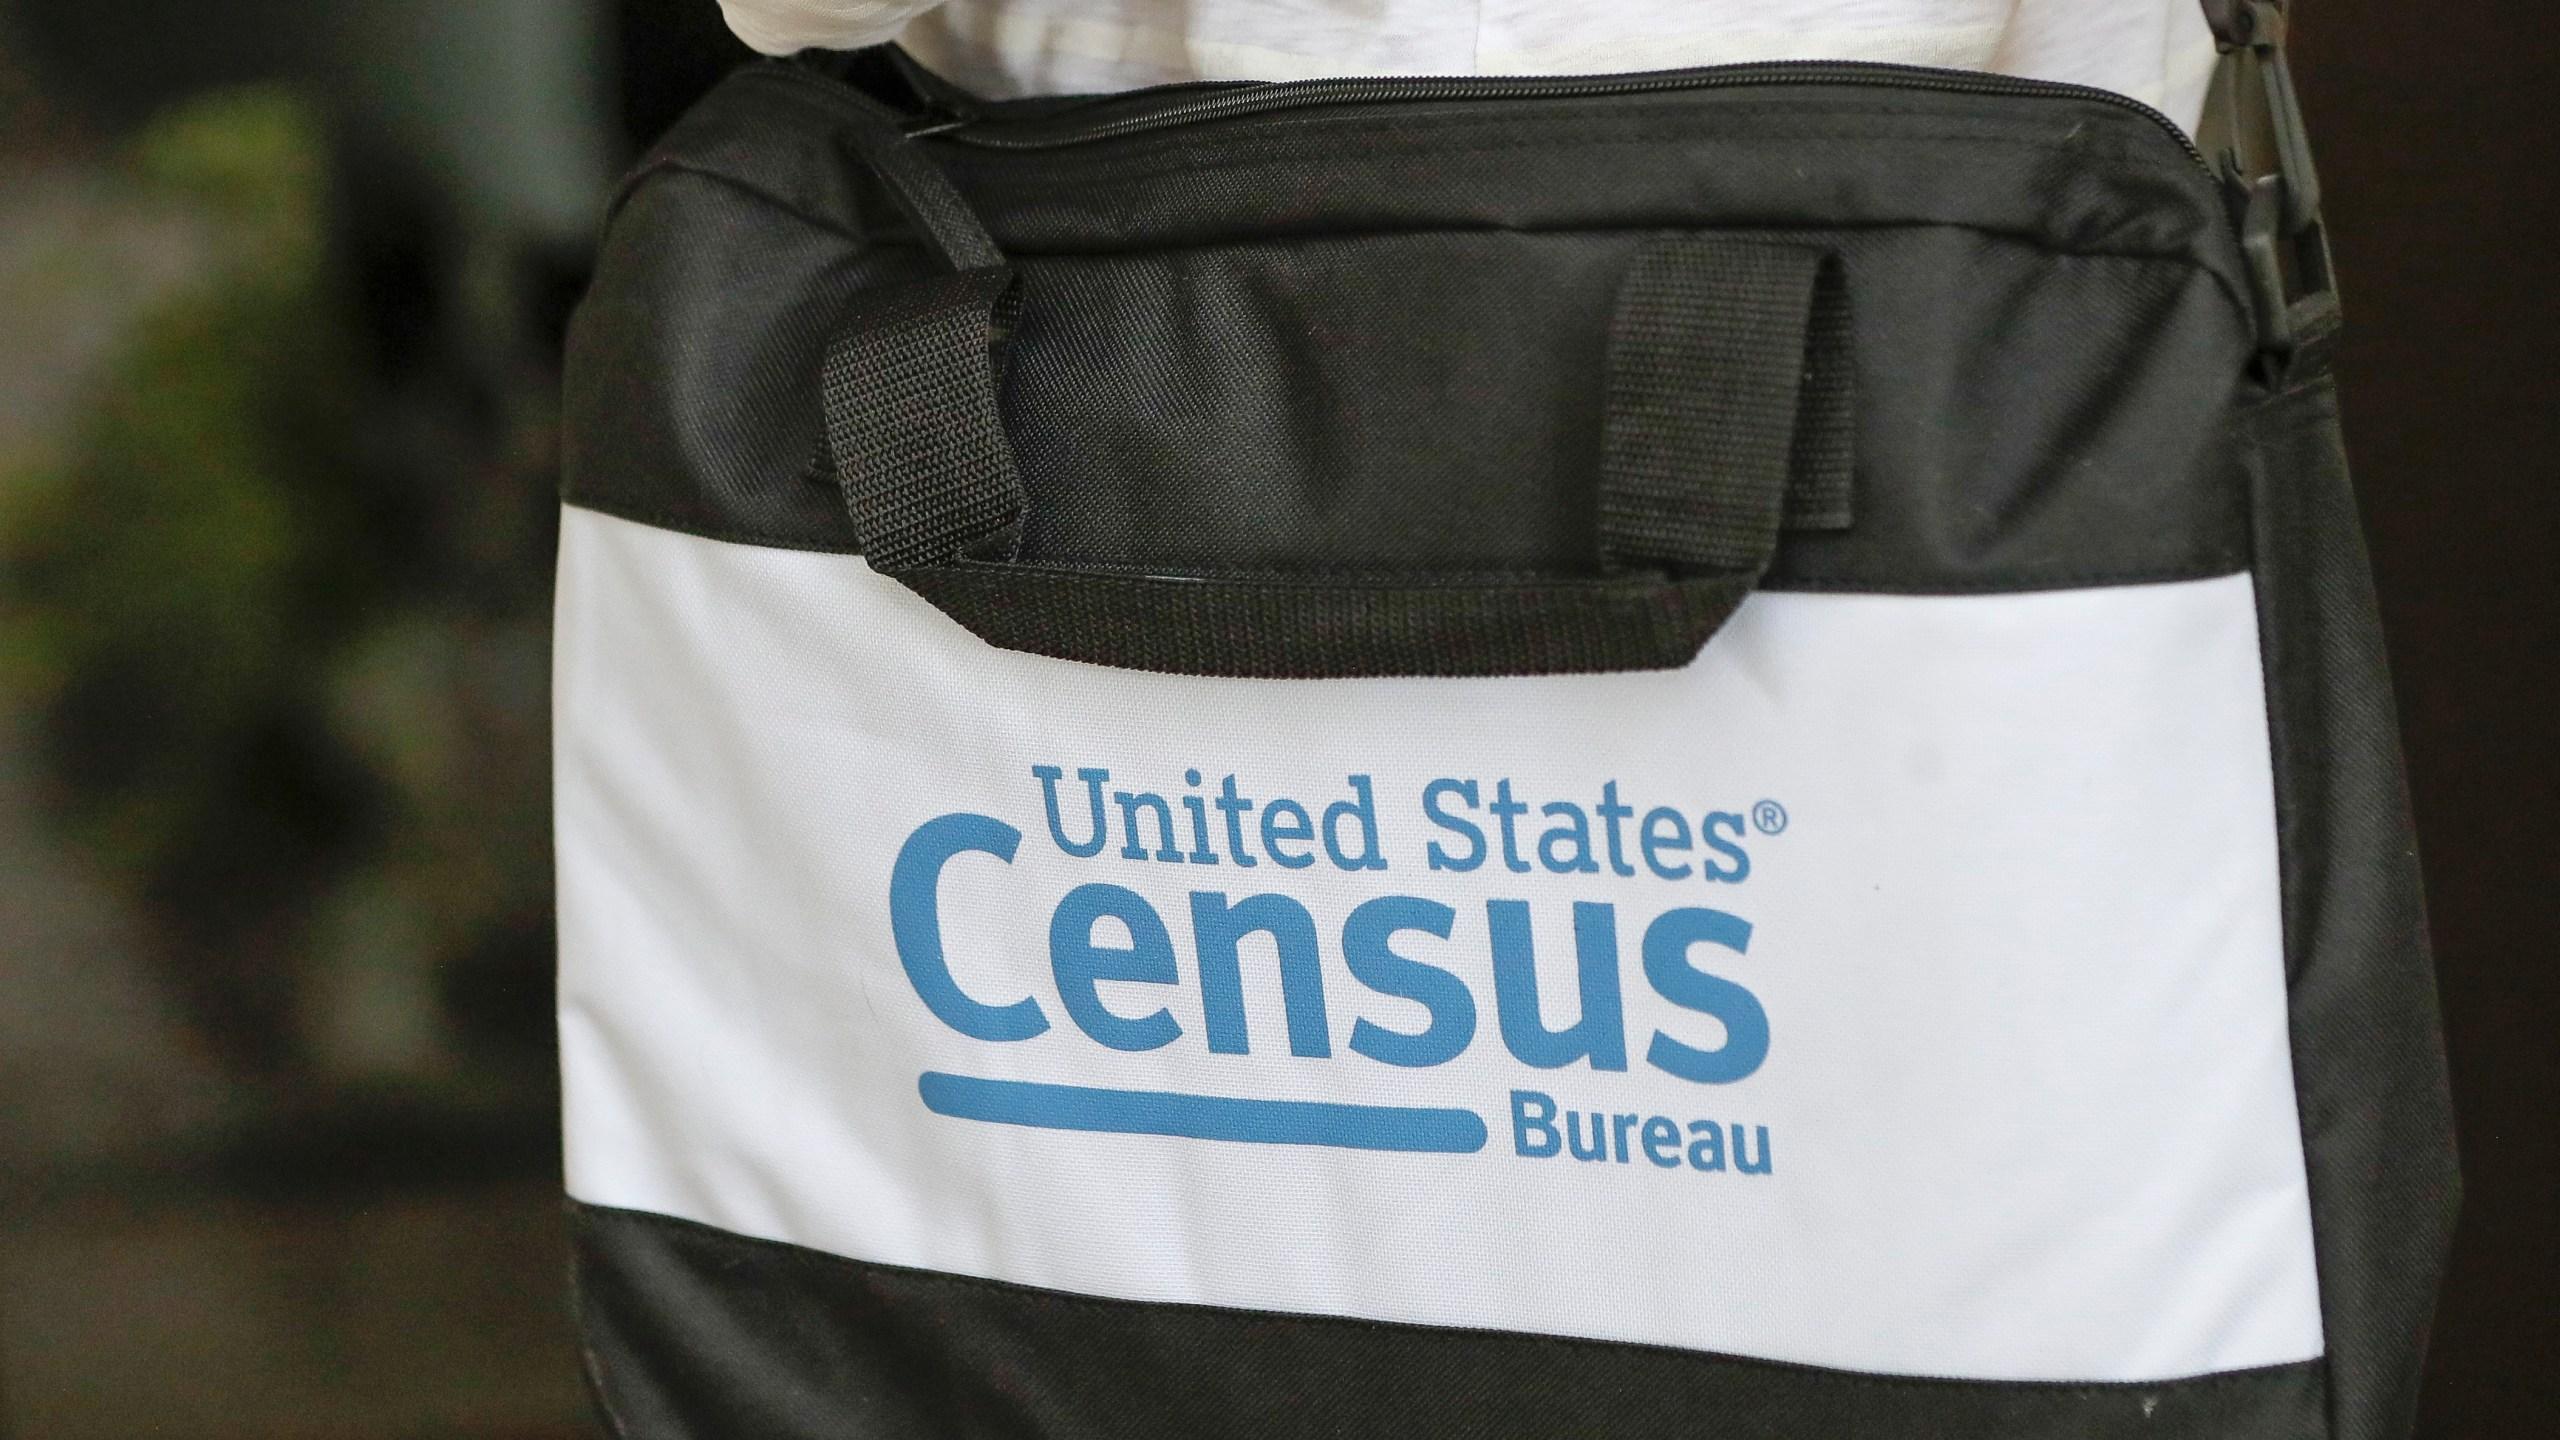 100 % Oj 2020 Halloween Events Endiing Cities sue Census Bureau over ending 2020 head count early